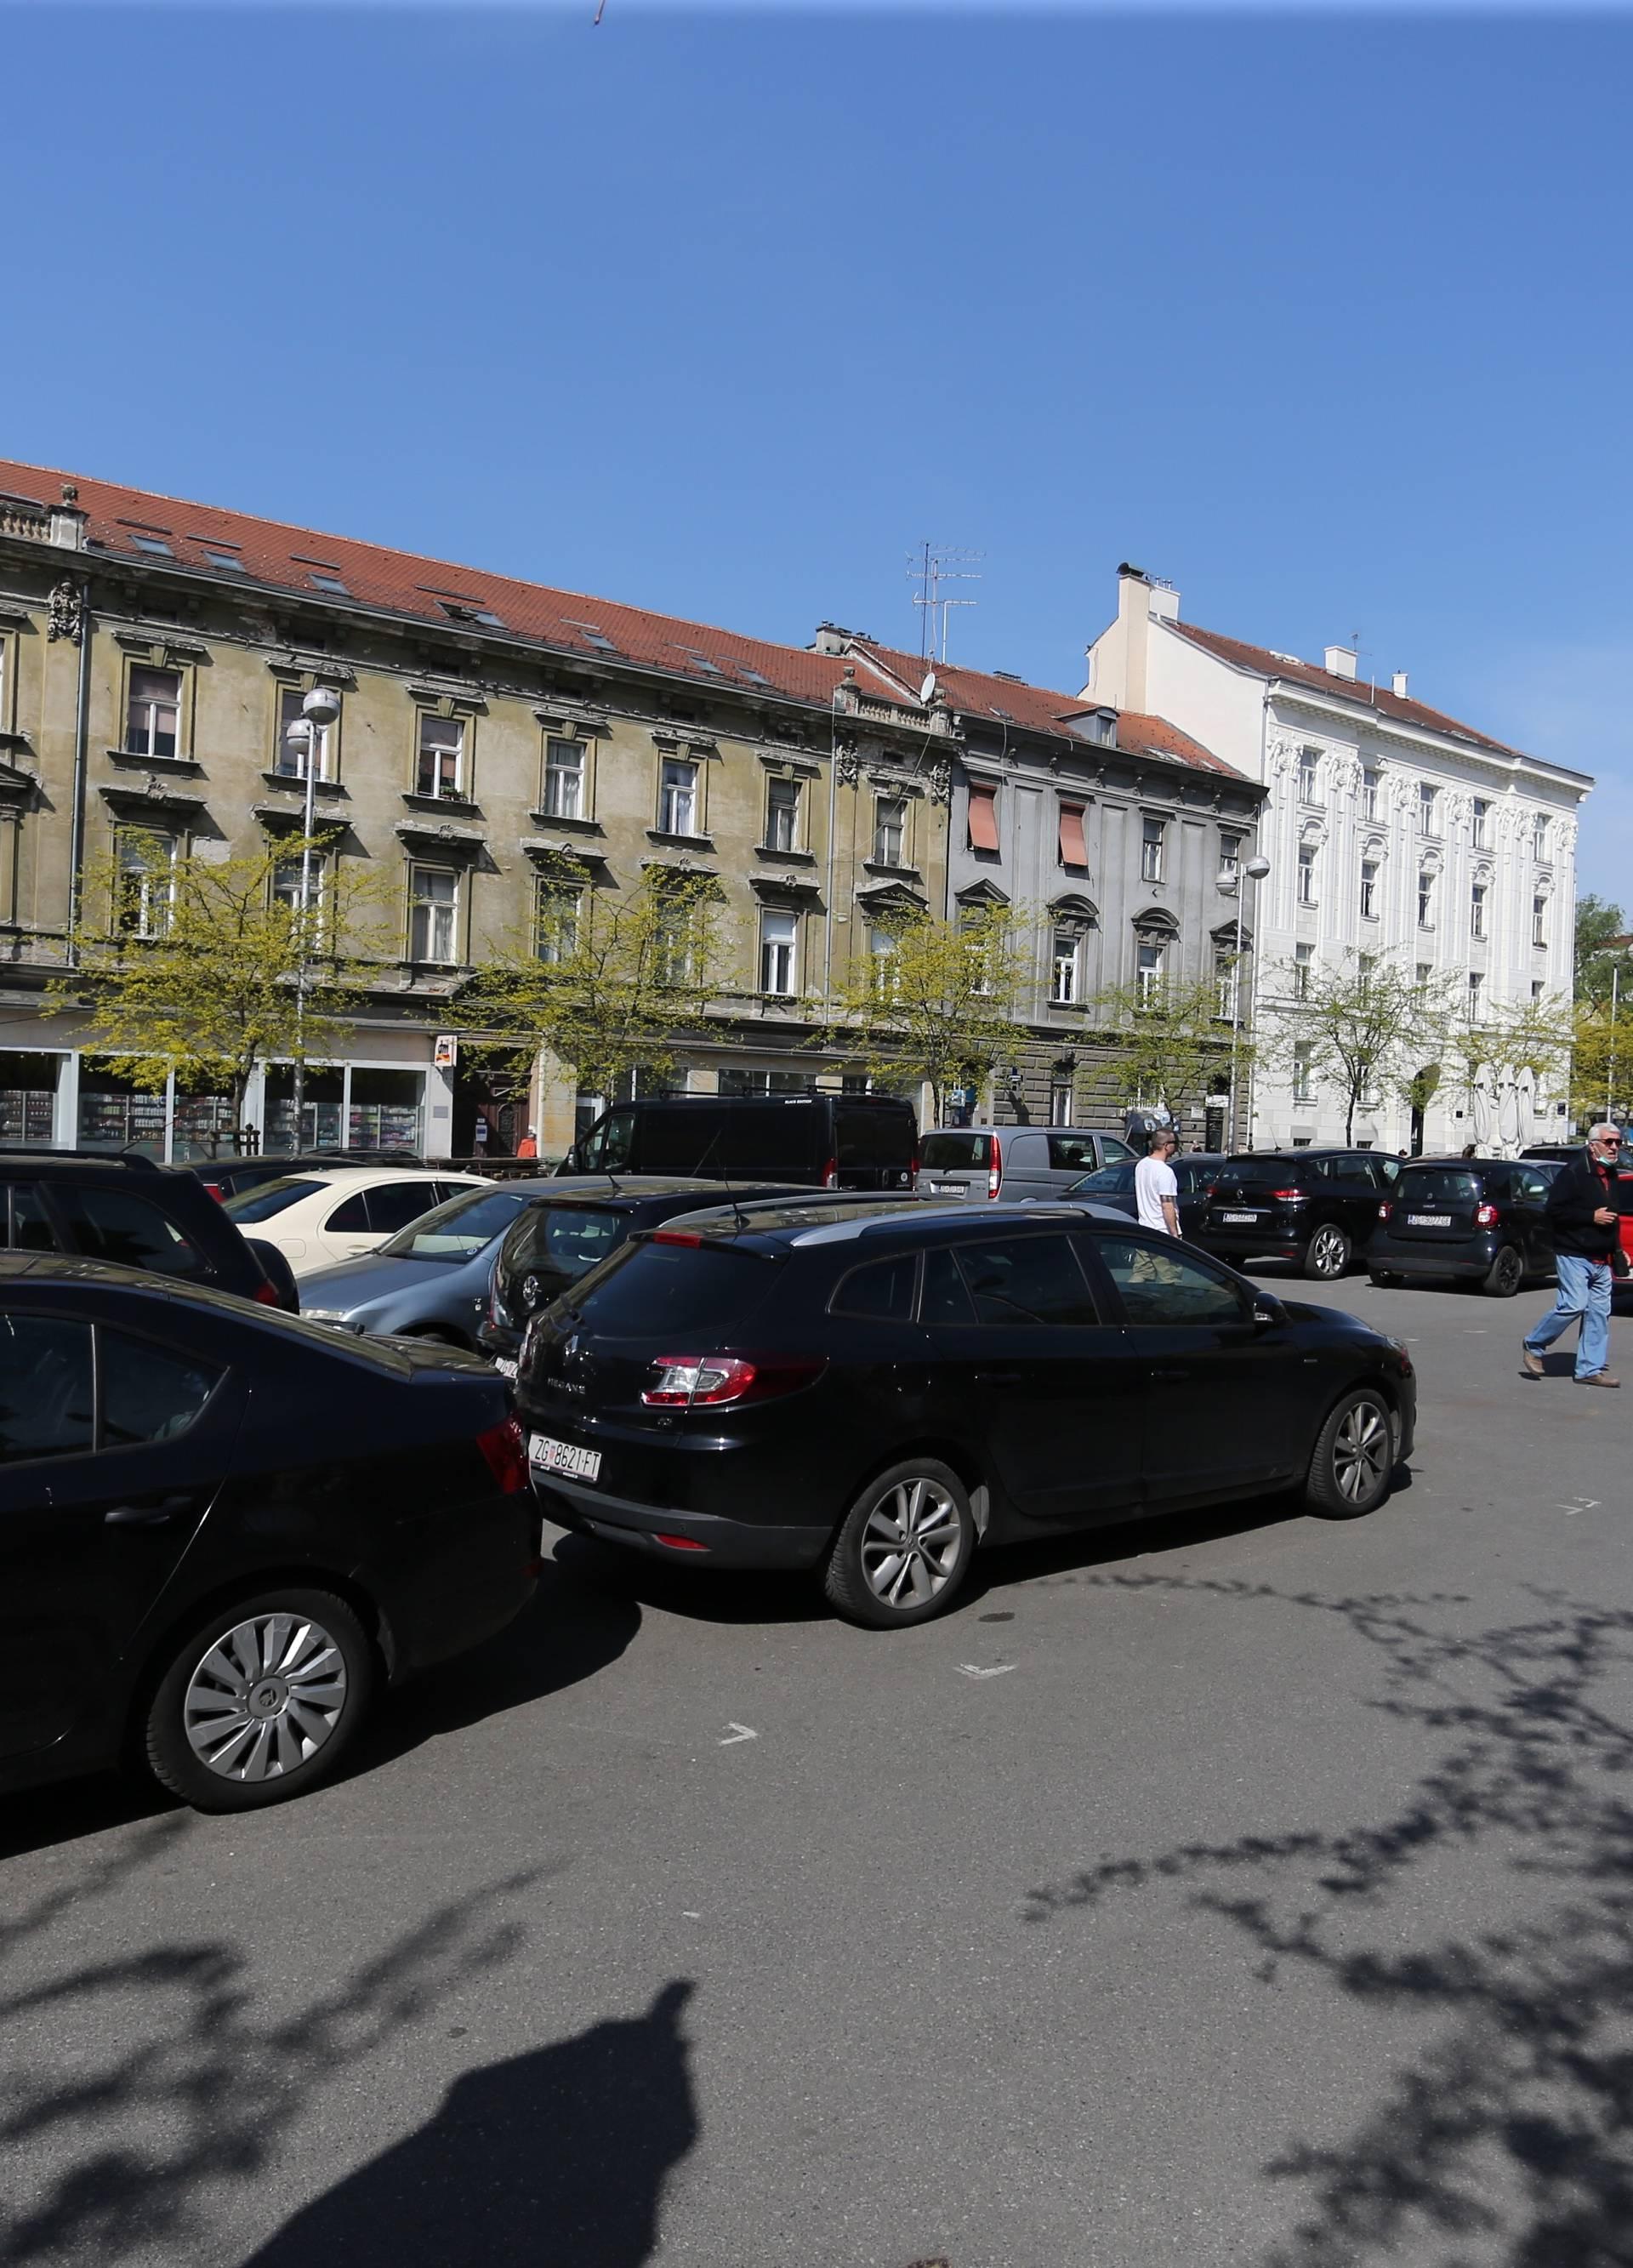 Zagreb: Nakon potresa Britanski trg je postao parkiralište za automobile